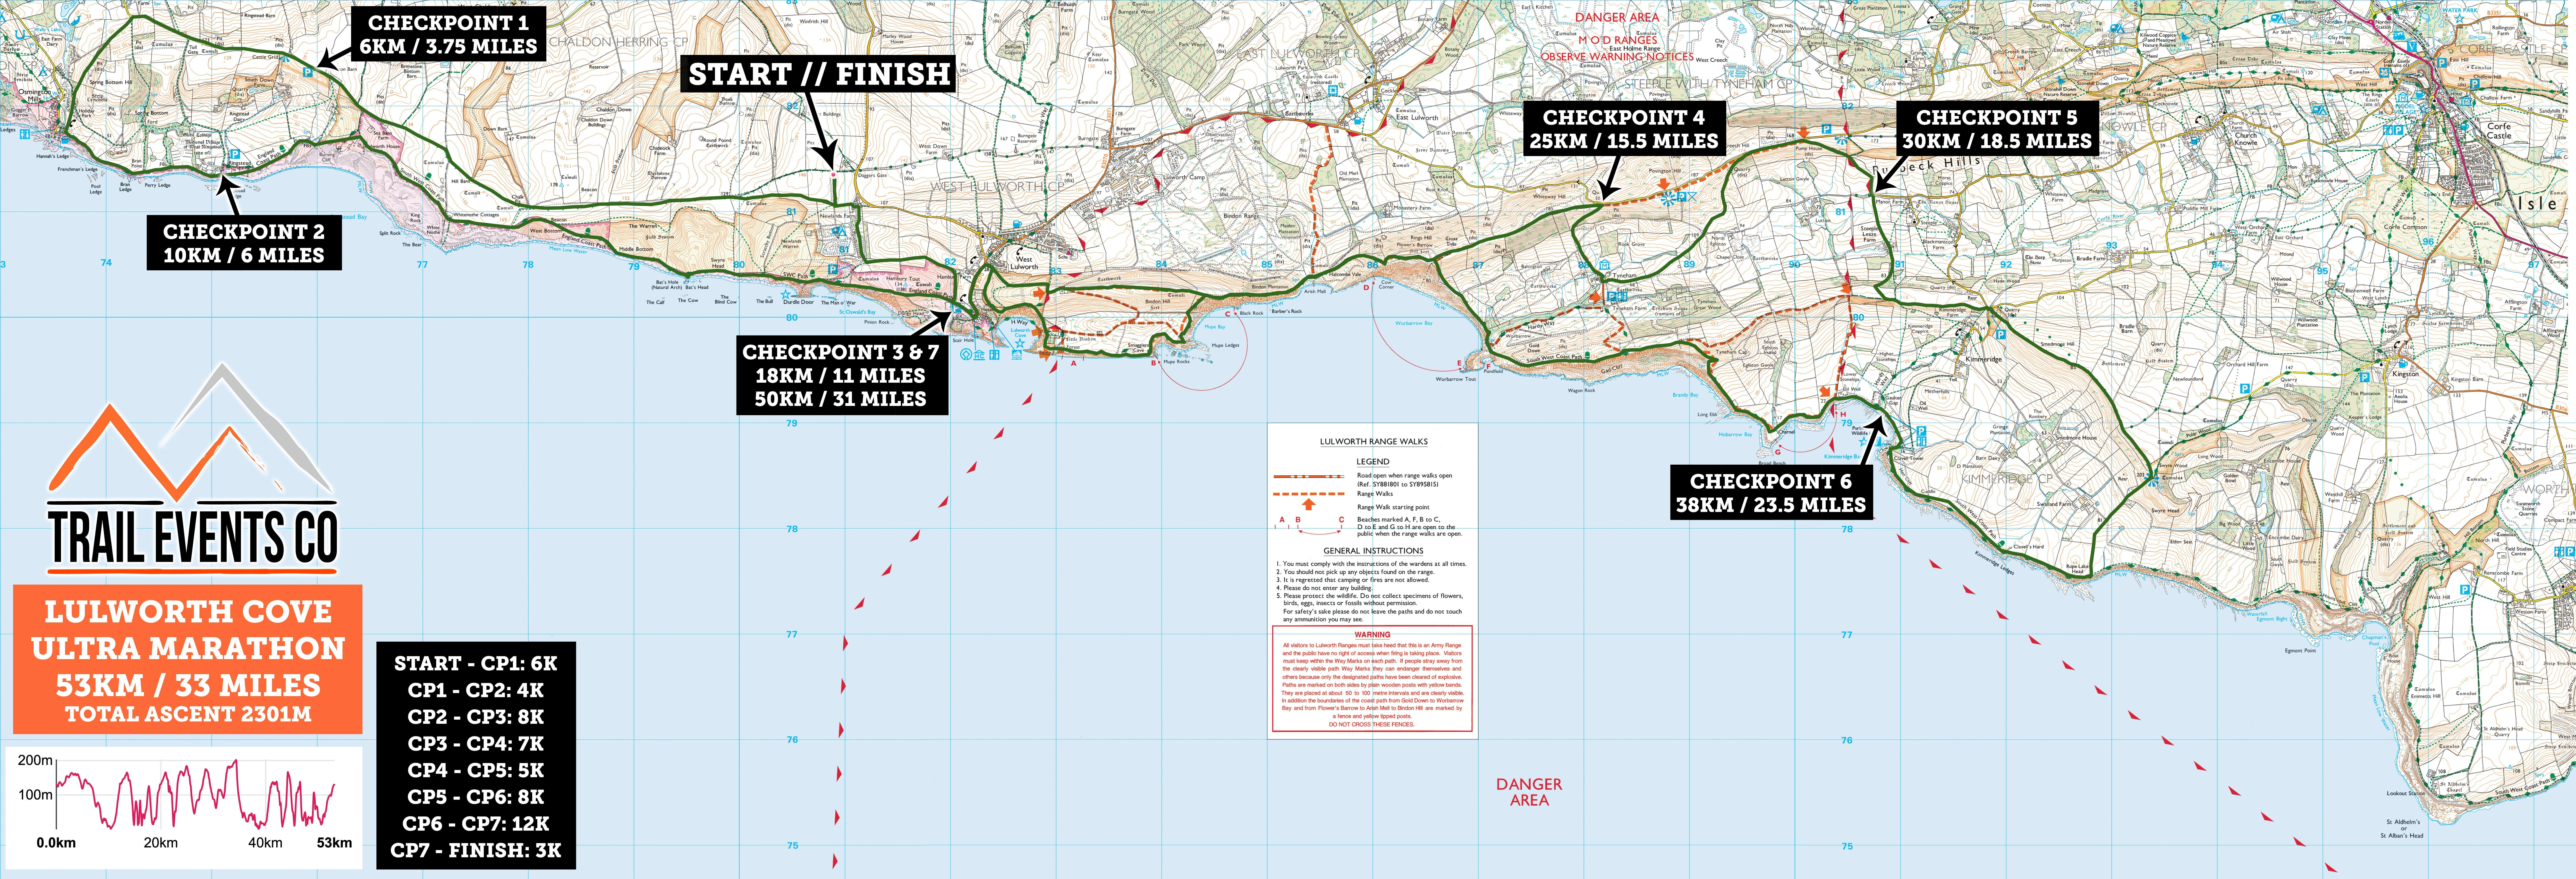 Lulworth Cove - Ultra Marathon